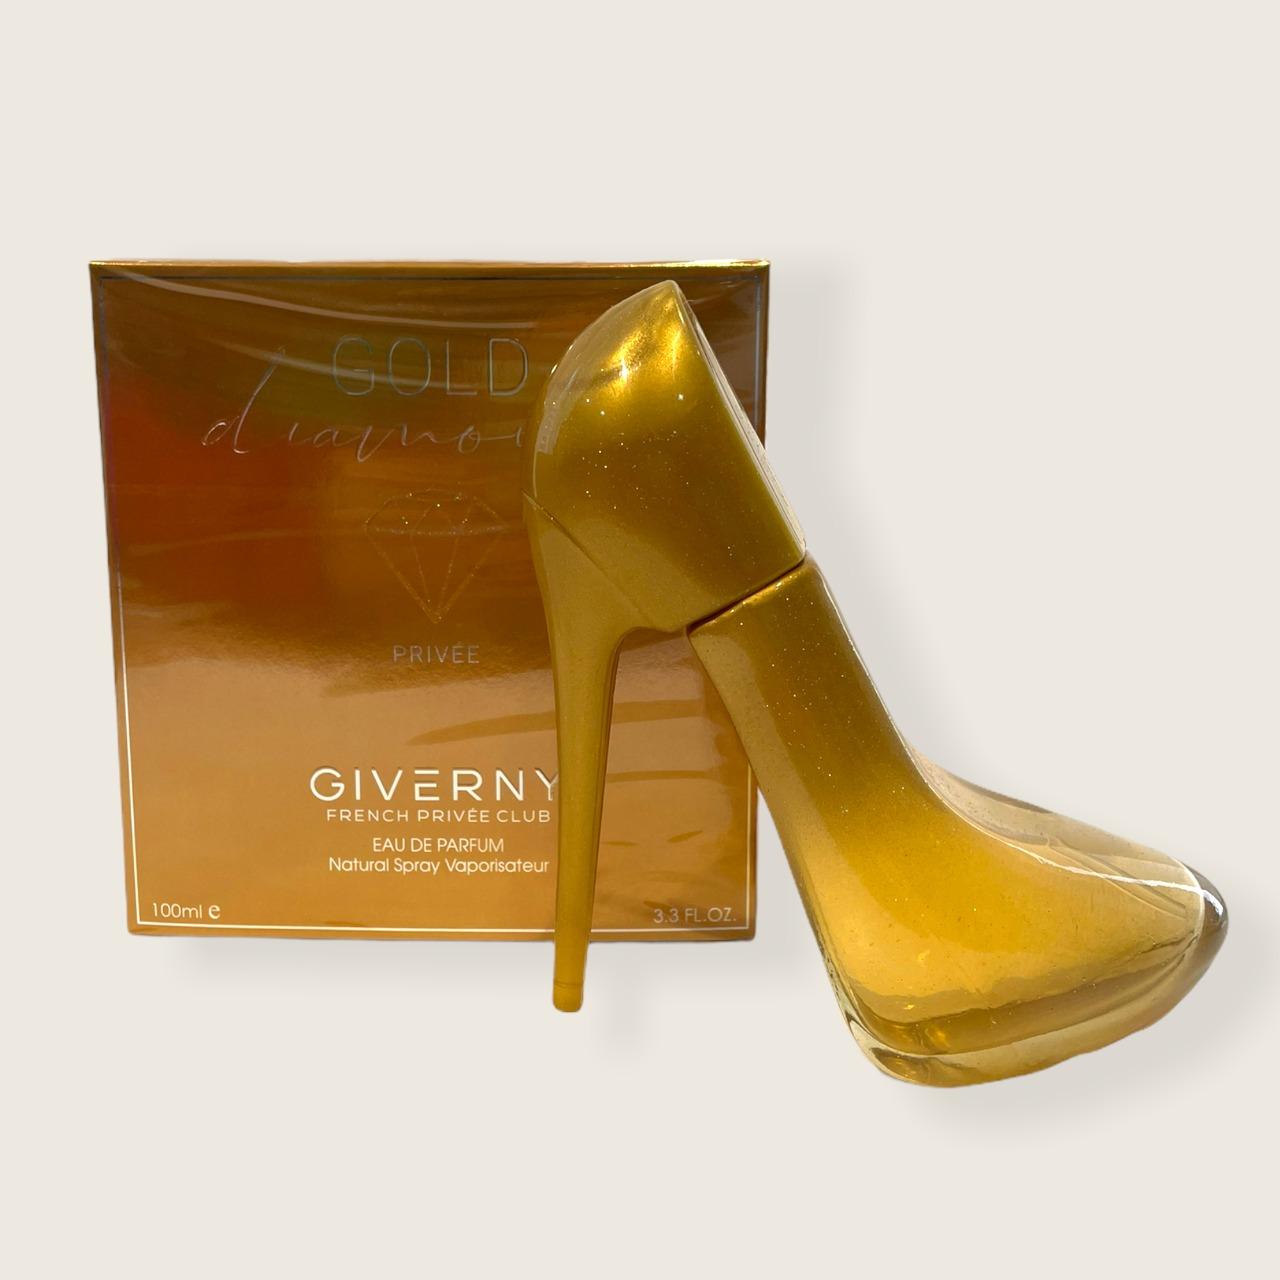 Gold Diamond Privée Giverny Eau de Parfum 100ml